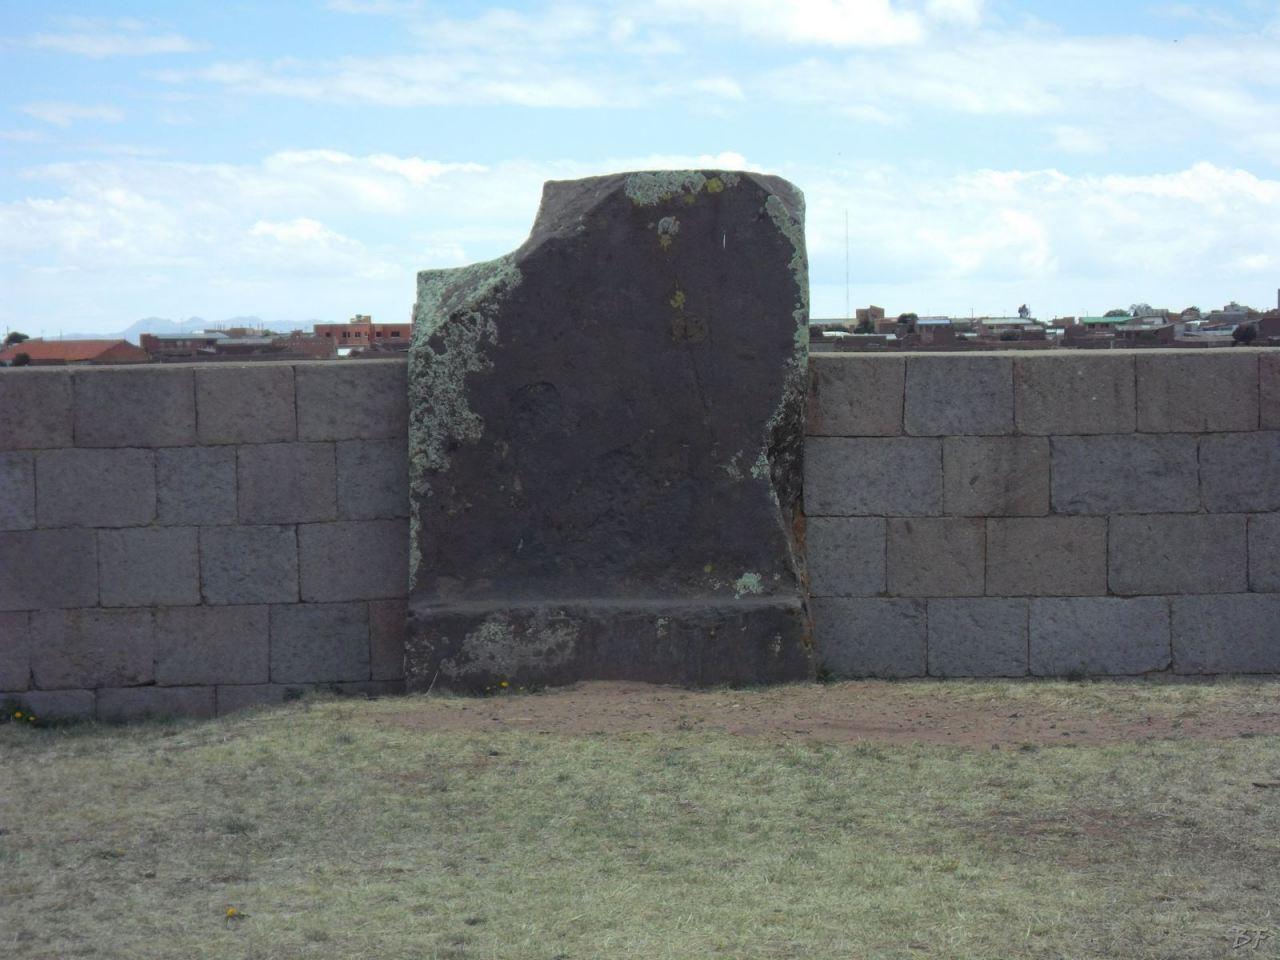 Sito-Megalitico-Piramide-Akapana-Kalasasaya-Menhir-Tiahuanaco-Bolivia-51